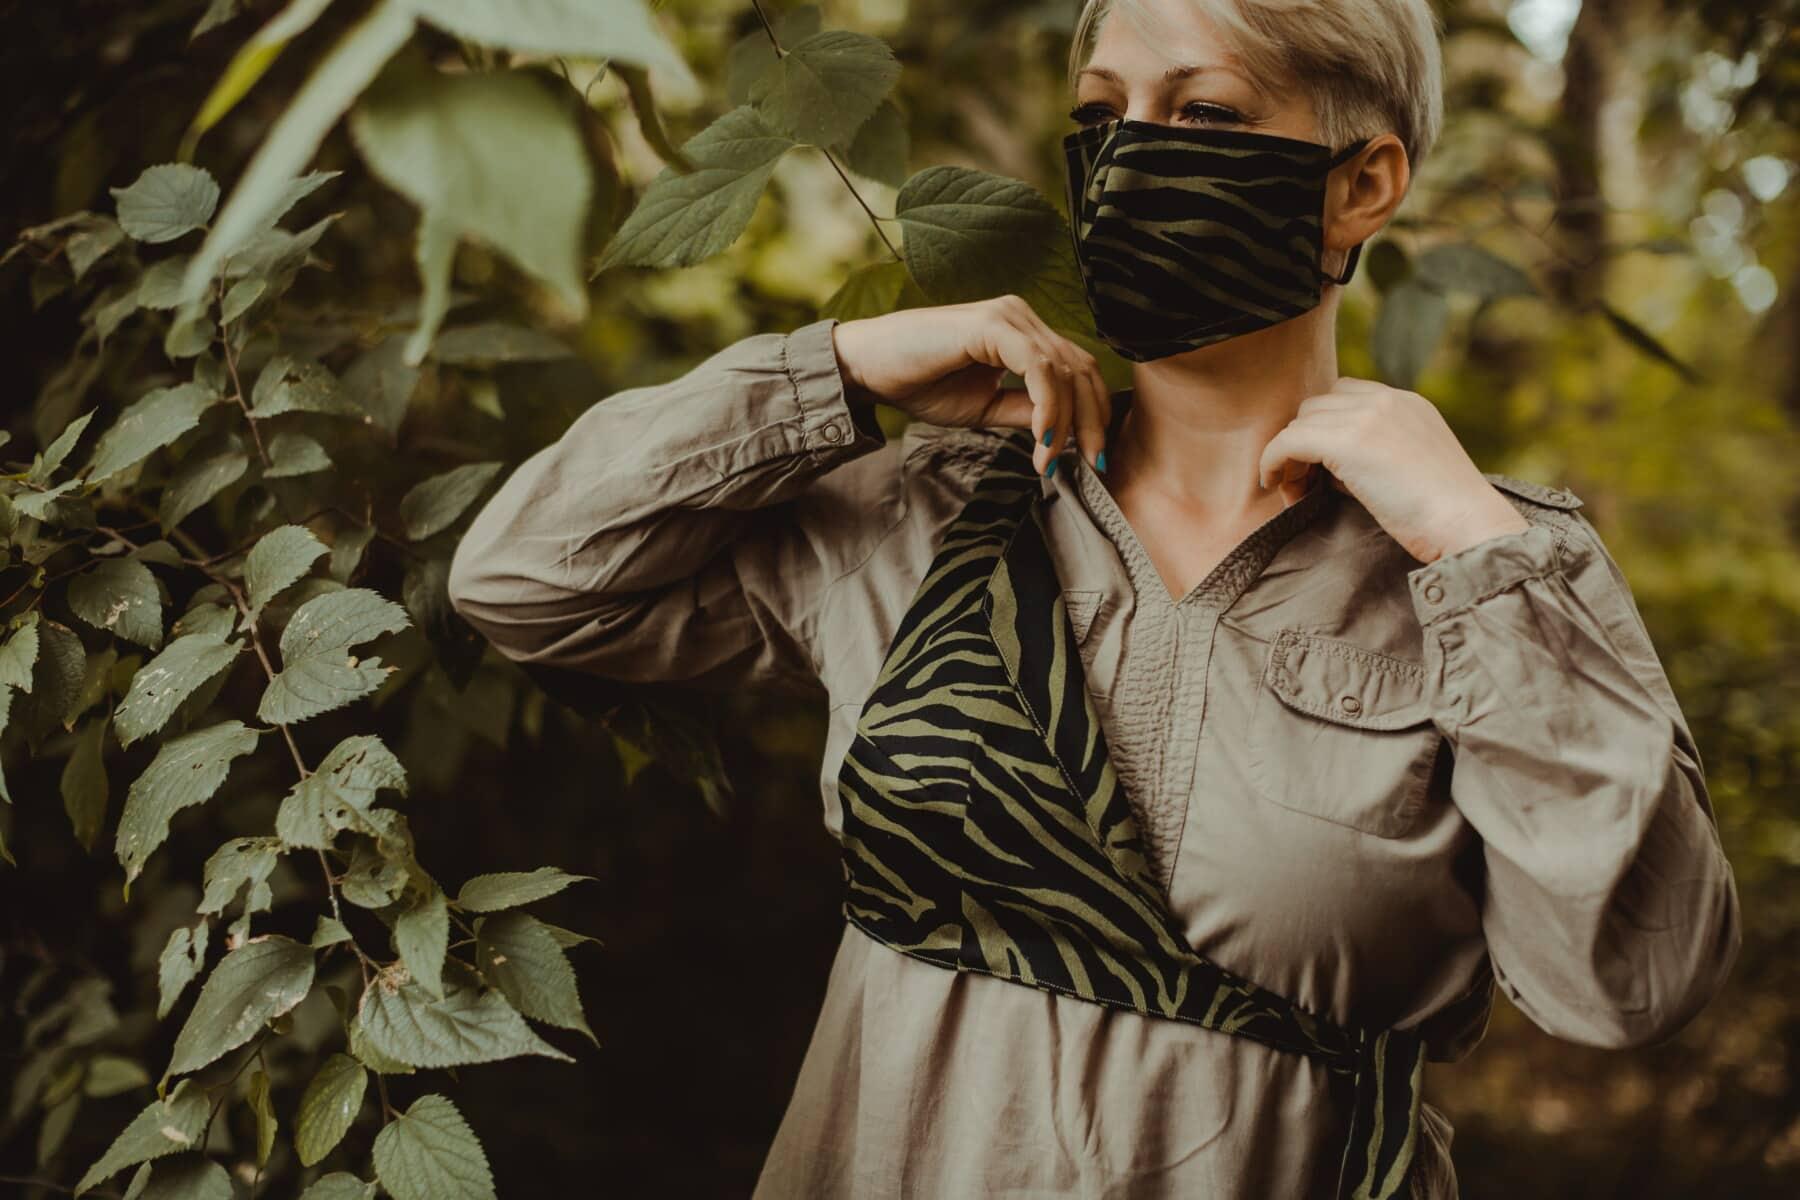 modern, pretty girl, fashion, face mask, uniform, camouflage, leaf, portrait, girl, nature